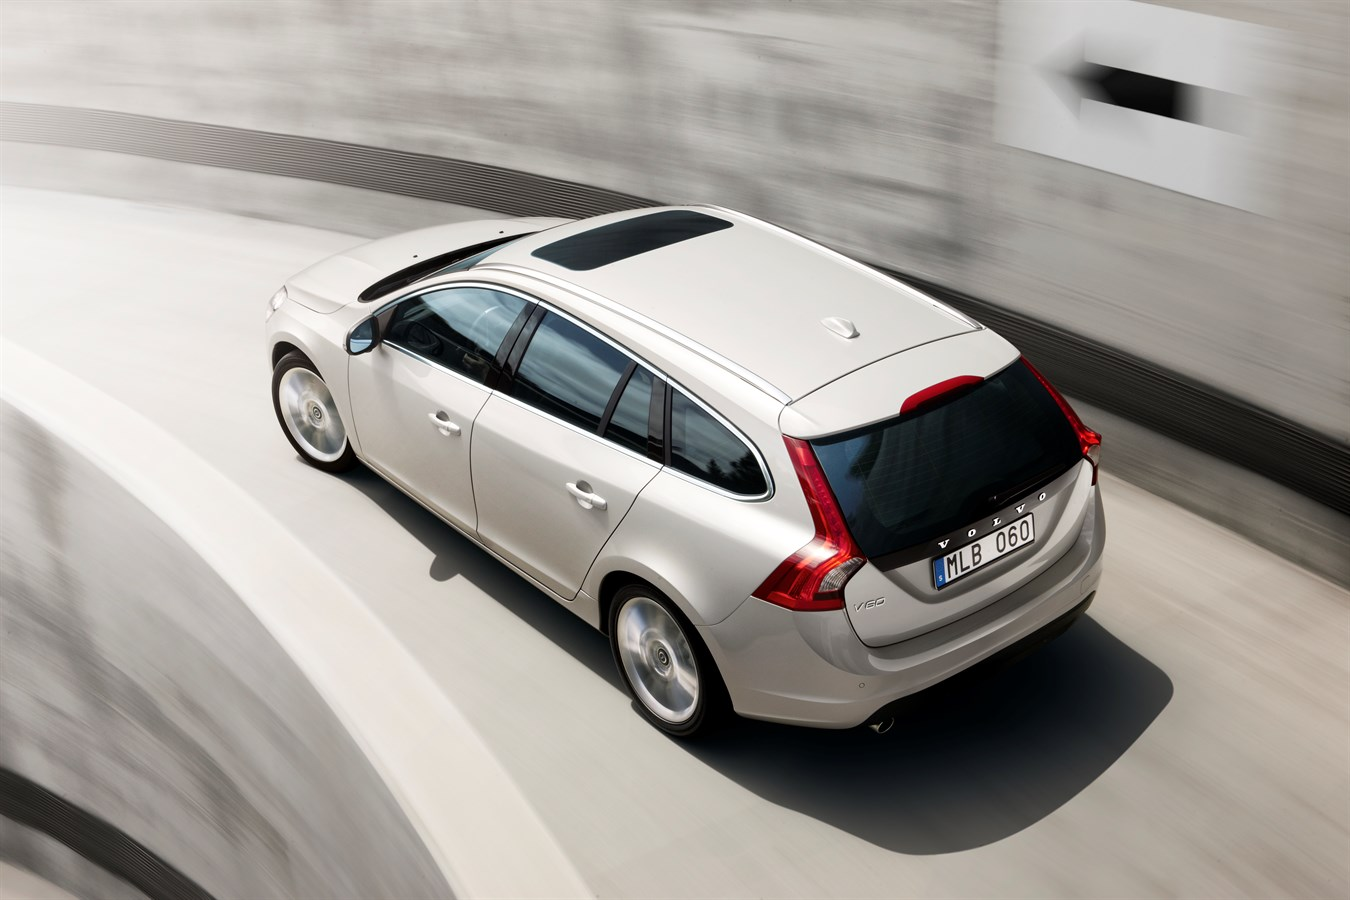 New volvo v60 sports wagon as sporty as the all new s60 volvo car group global media newsroom